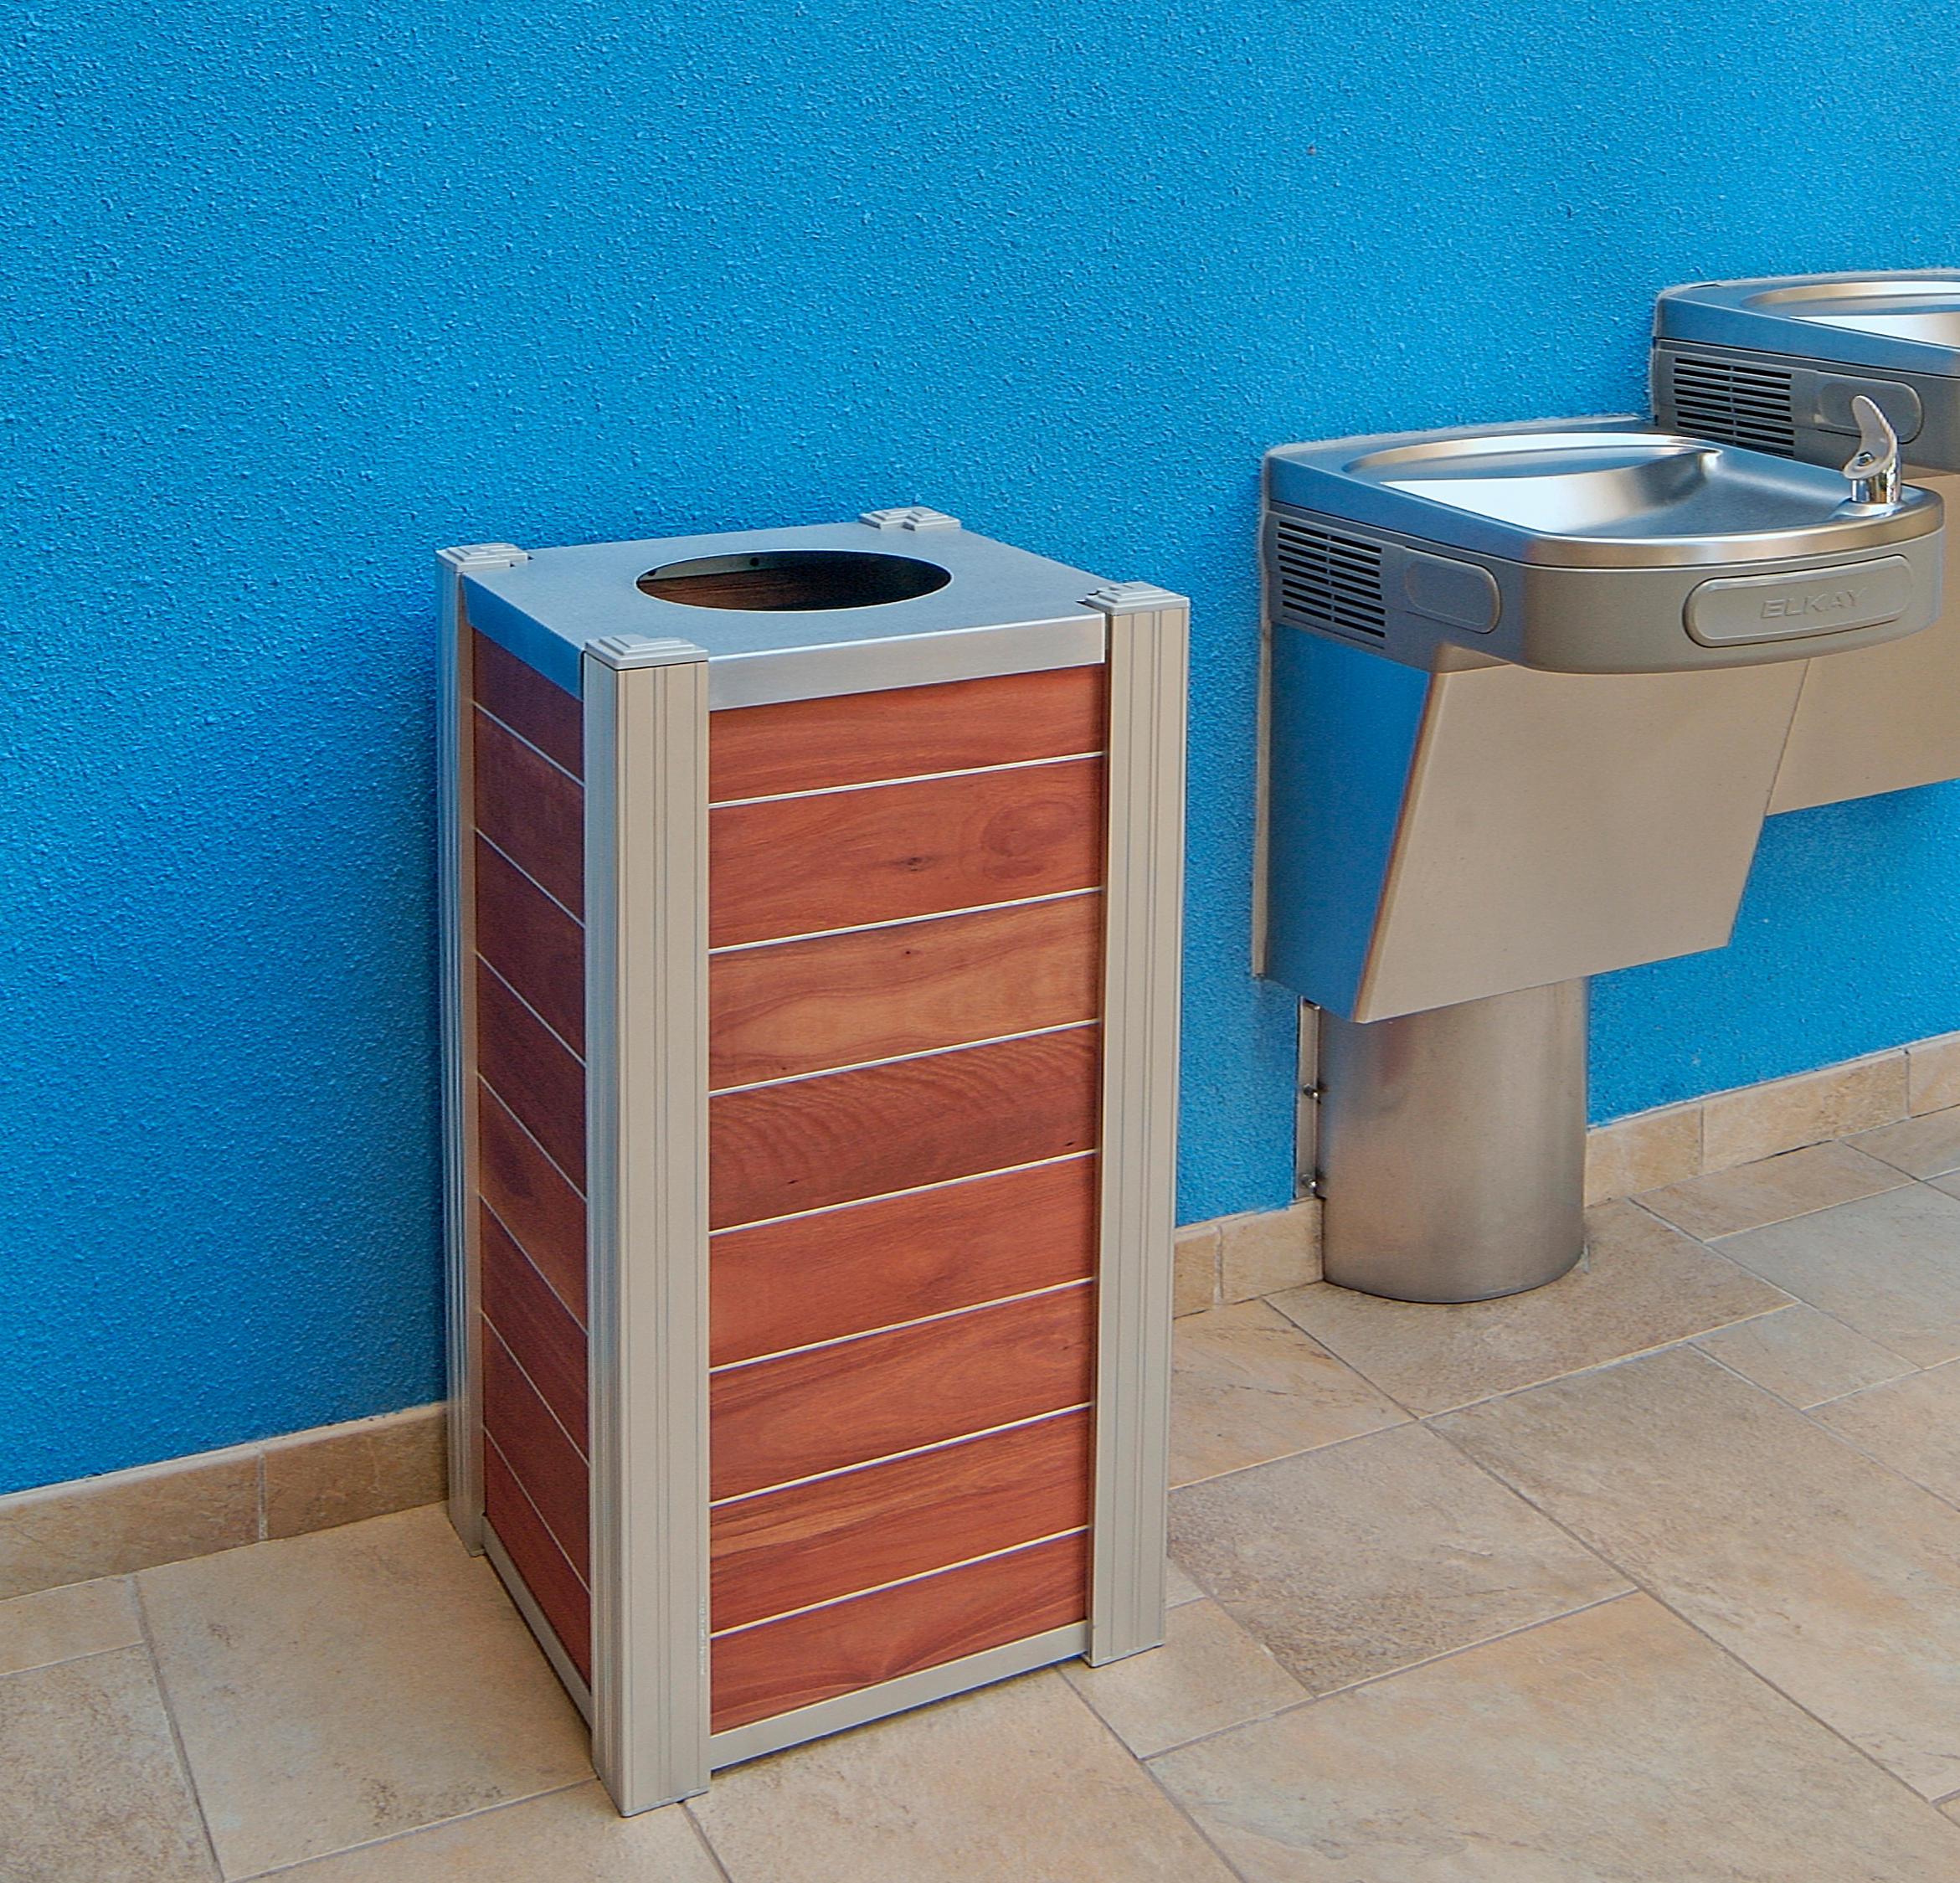 Audubon 21 gallon bins bidoni per immondizia deepstream for Arredo urbano in inglese